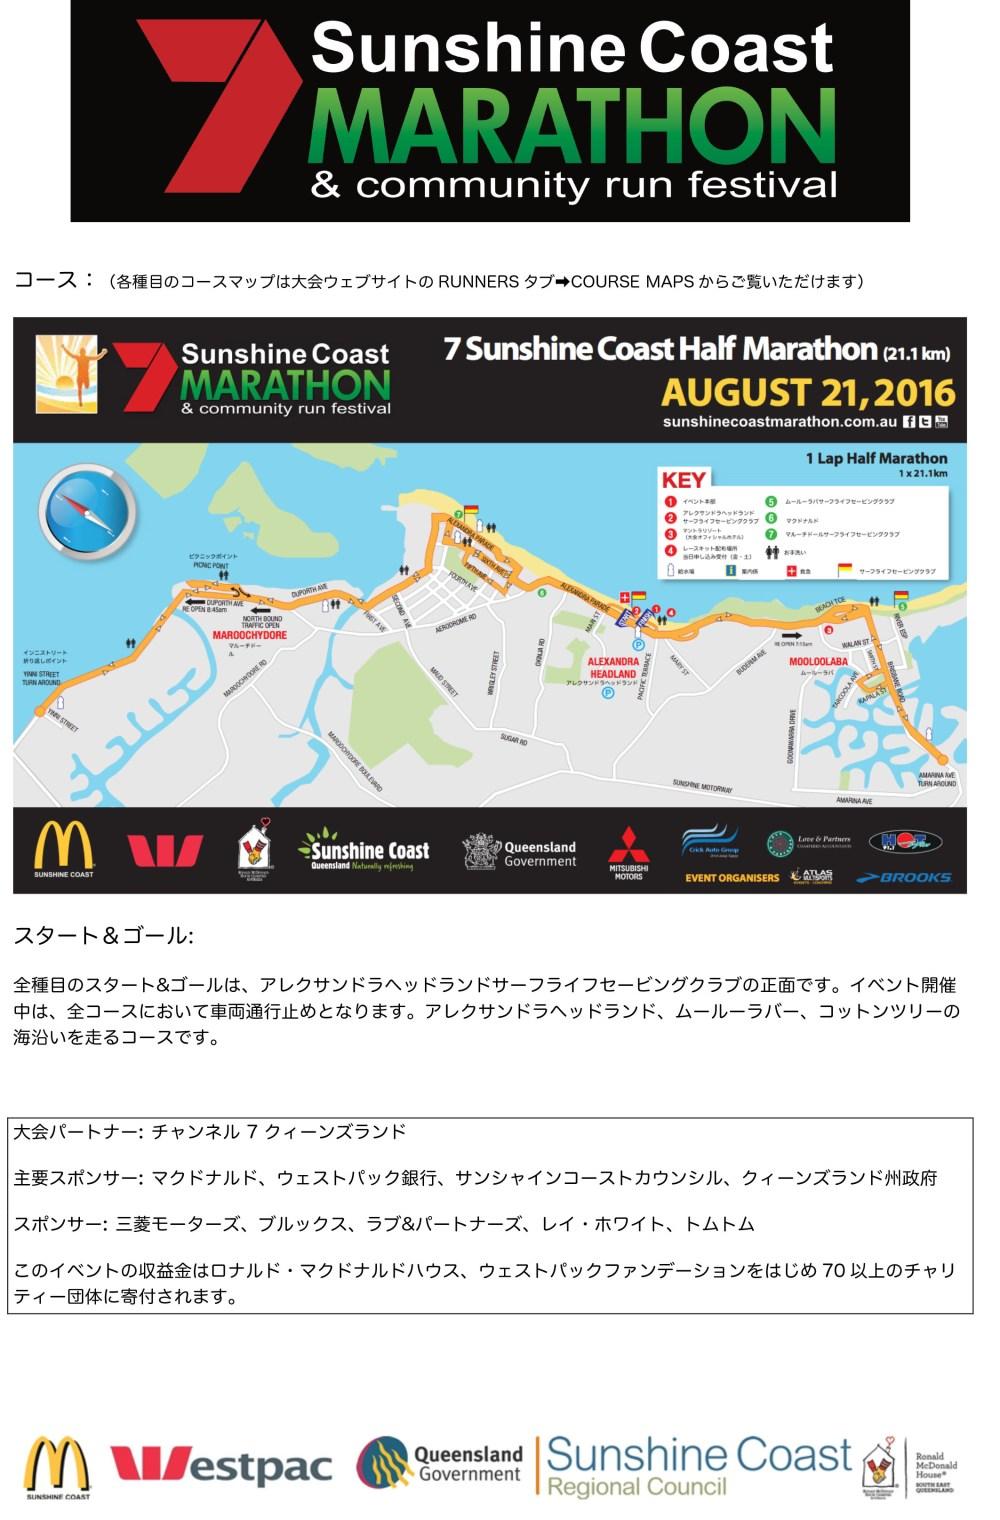 Microsoft Word - 7 Sunshine Coast Marathon Fact Sheet 2016 no tr